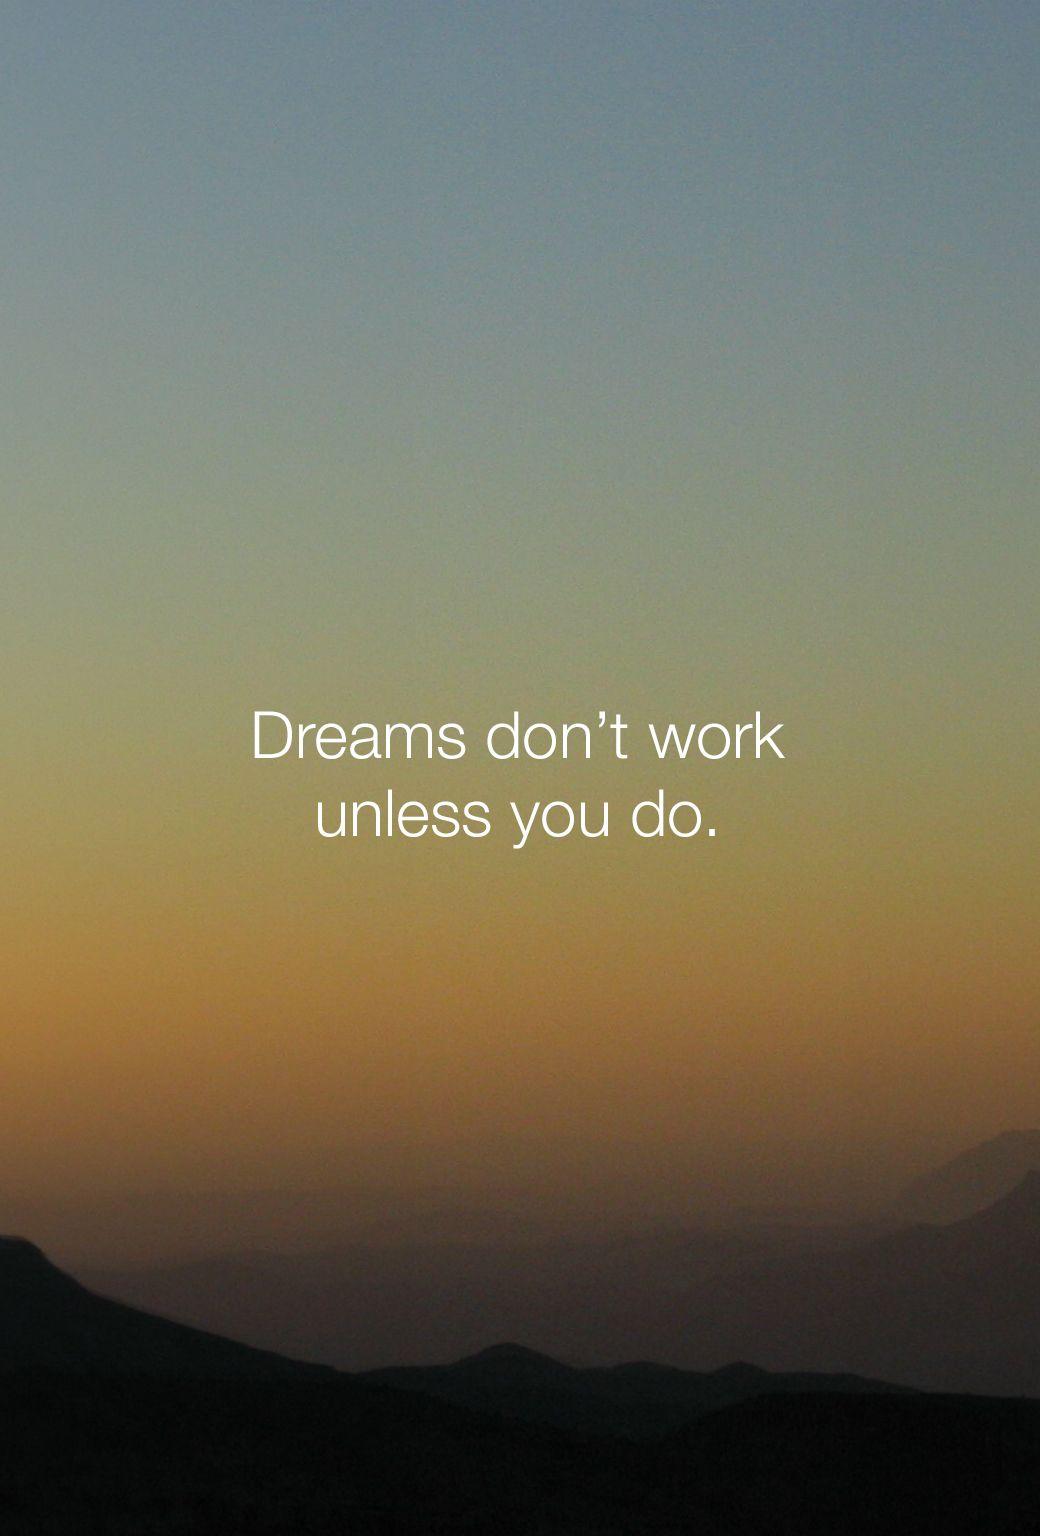 inspiring iphone wallpaper dreams don 39 t work unless you do motivation monday pinterest. Black Bedroom Furniture Sets. Home Design Ideas